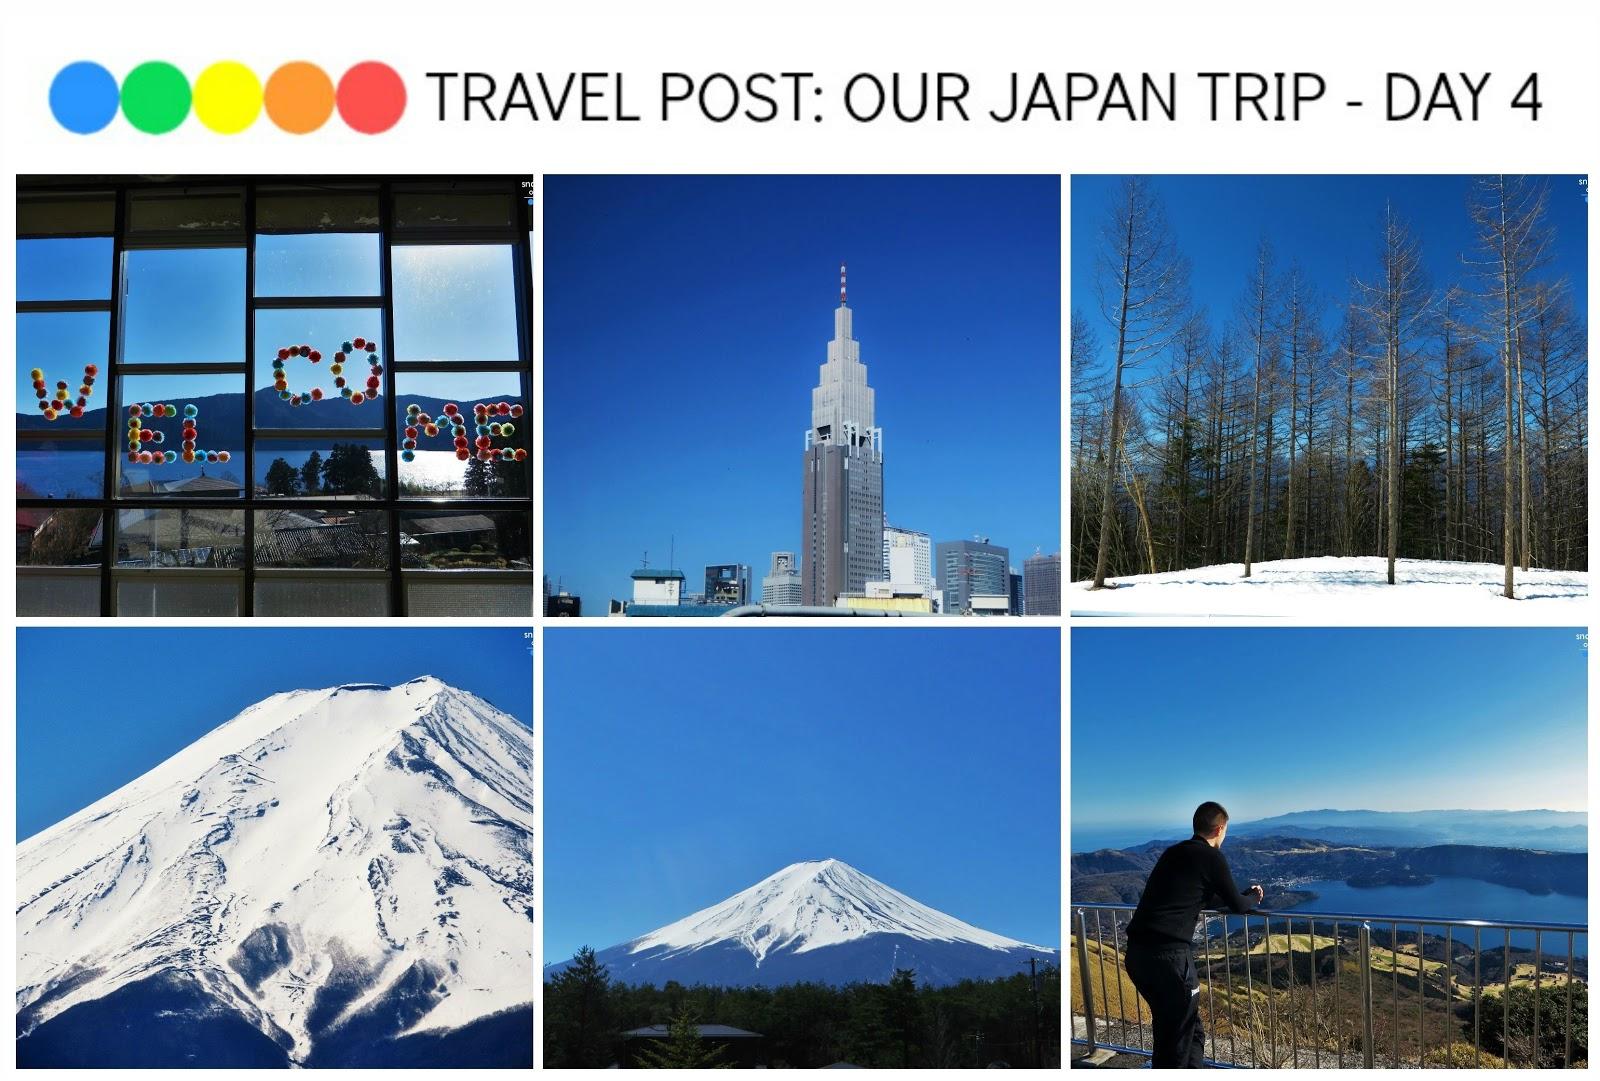 Travel post: Our Japan Trip - Day 4 (Mt Fuji, Lake Ashi, Mt Komagatake, Hakone National Park)